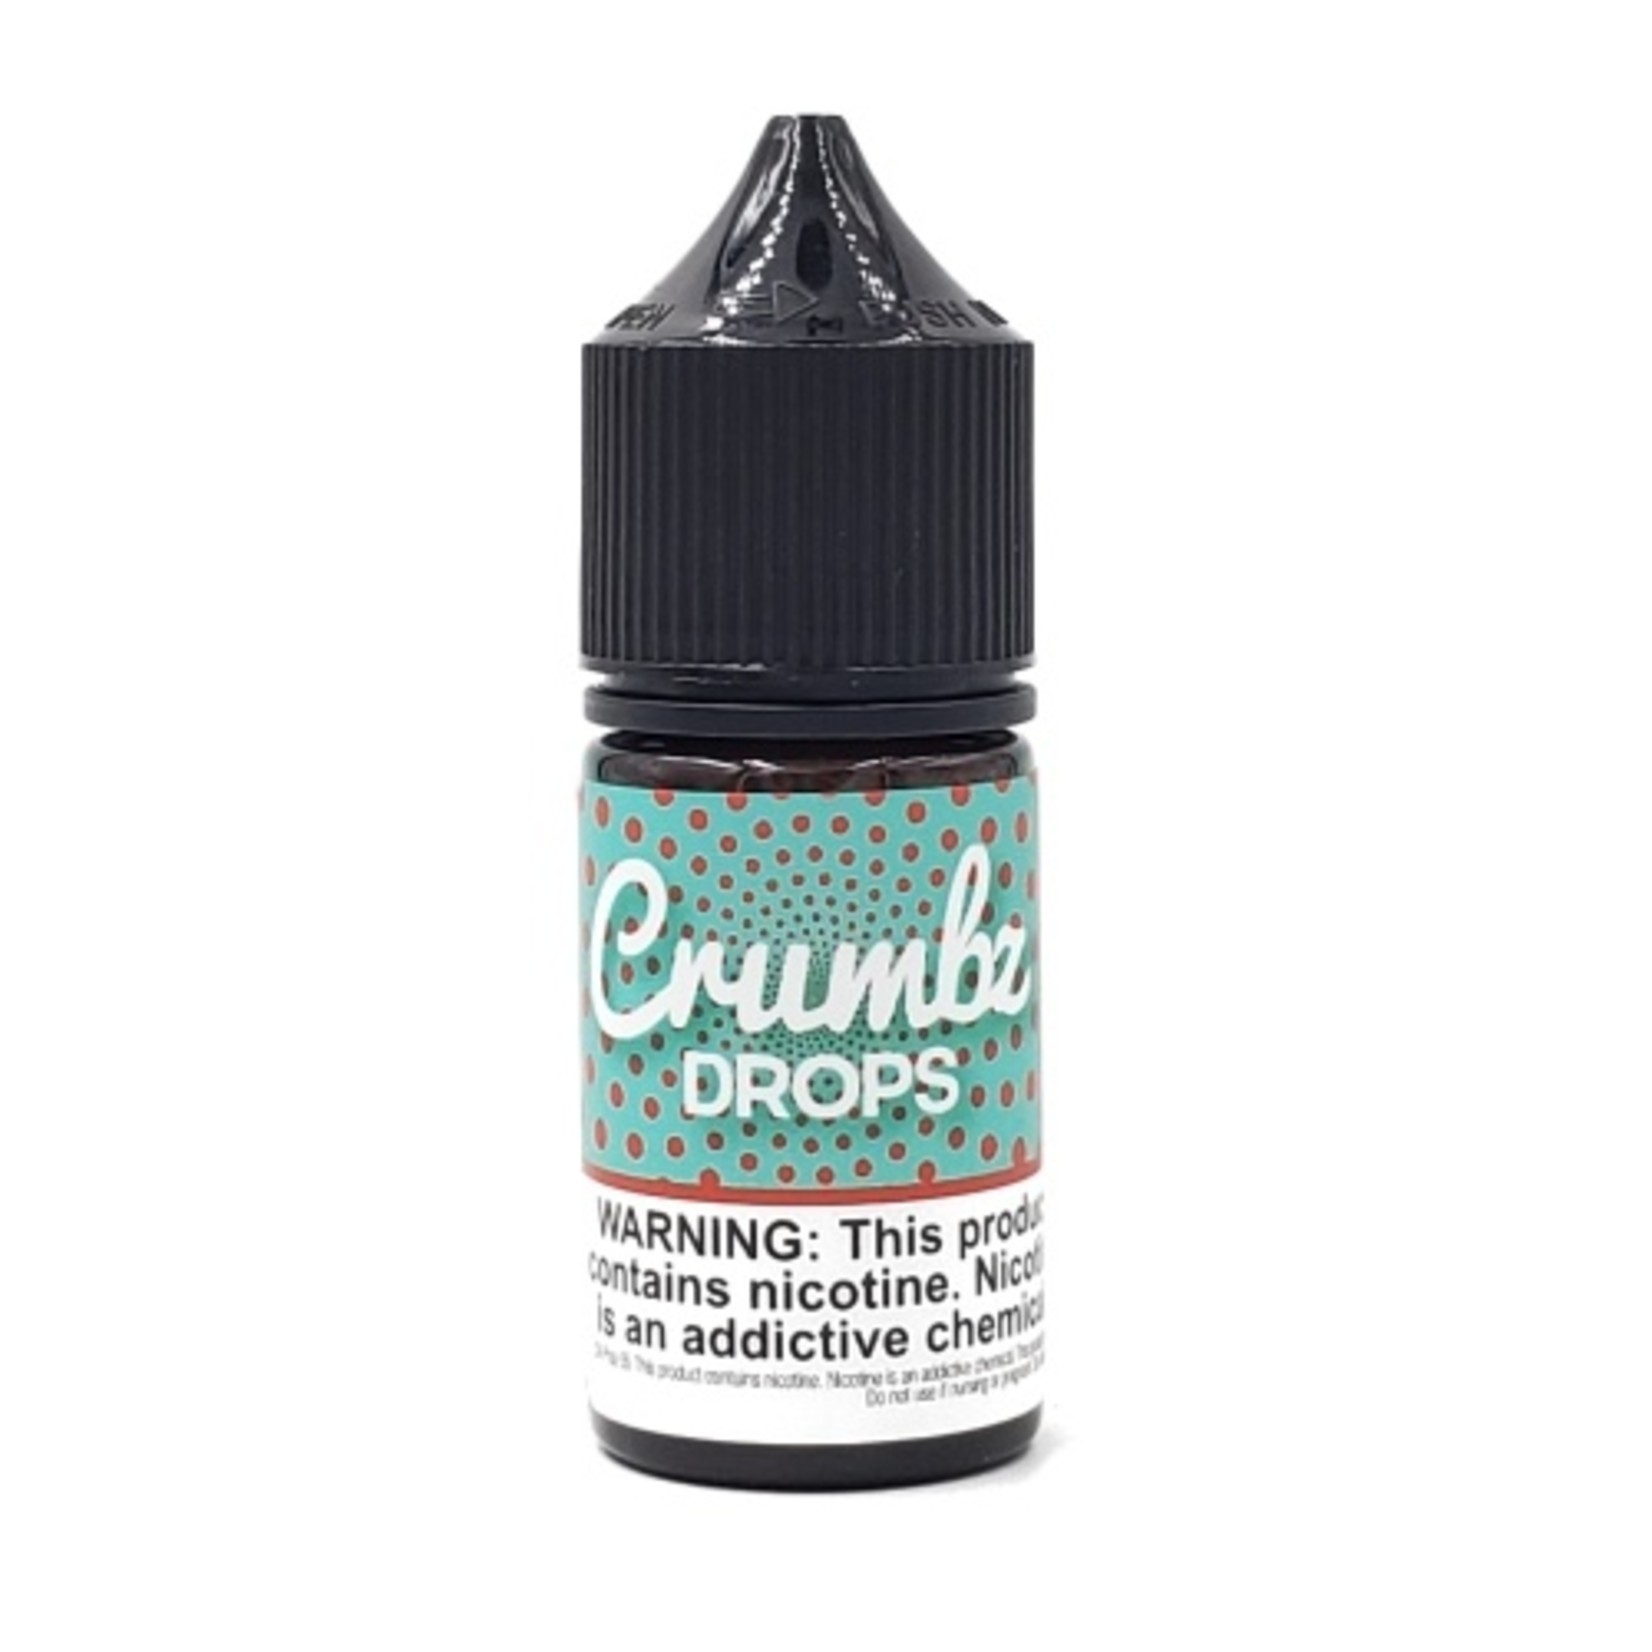 Crumbz Drops Short Straw Salt Nic Salt